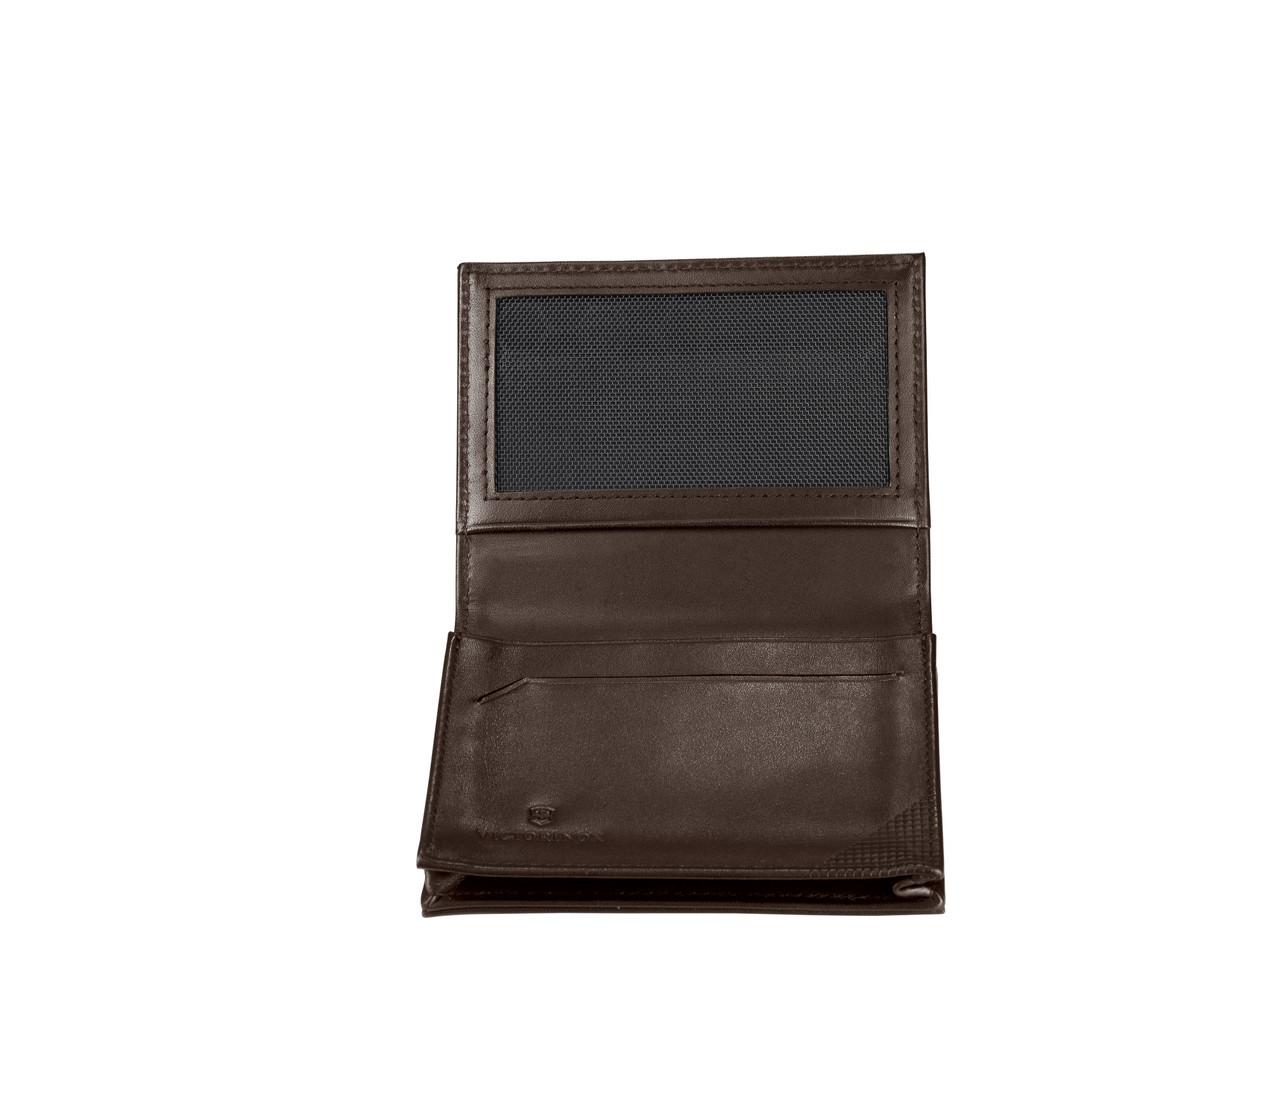 cb86ae87850391 Victorinox Altius Edge Cardano RFID Gusseted Leather Card Case ...